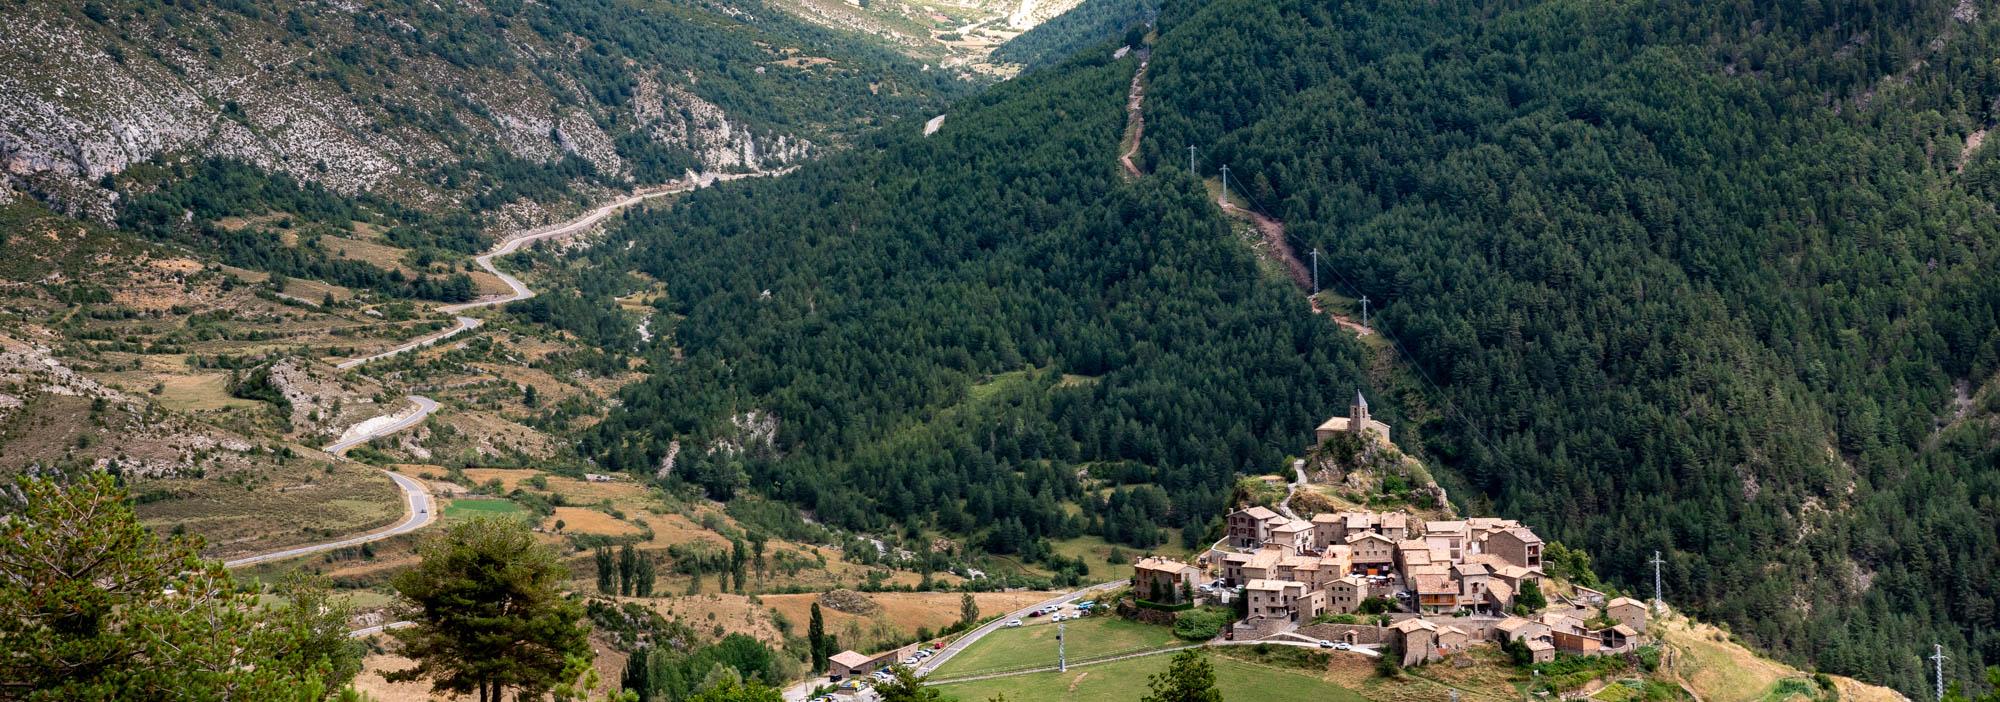 De Guardiola de Berguedà au parc naturel de Cadi